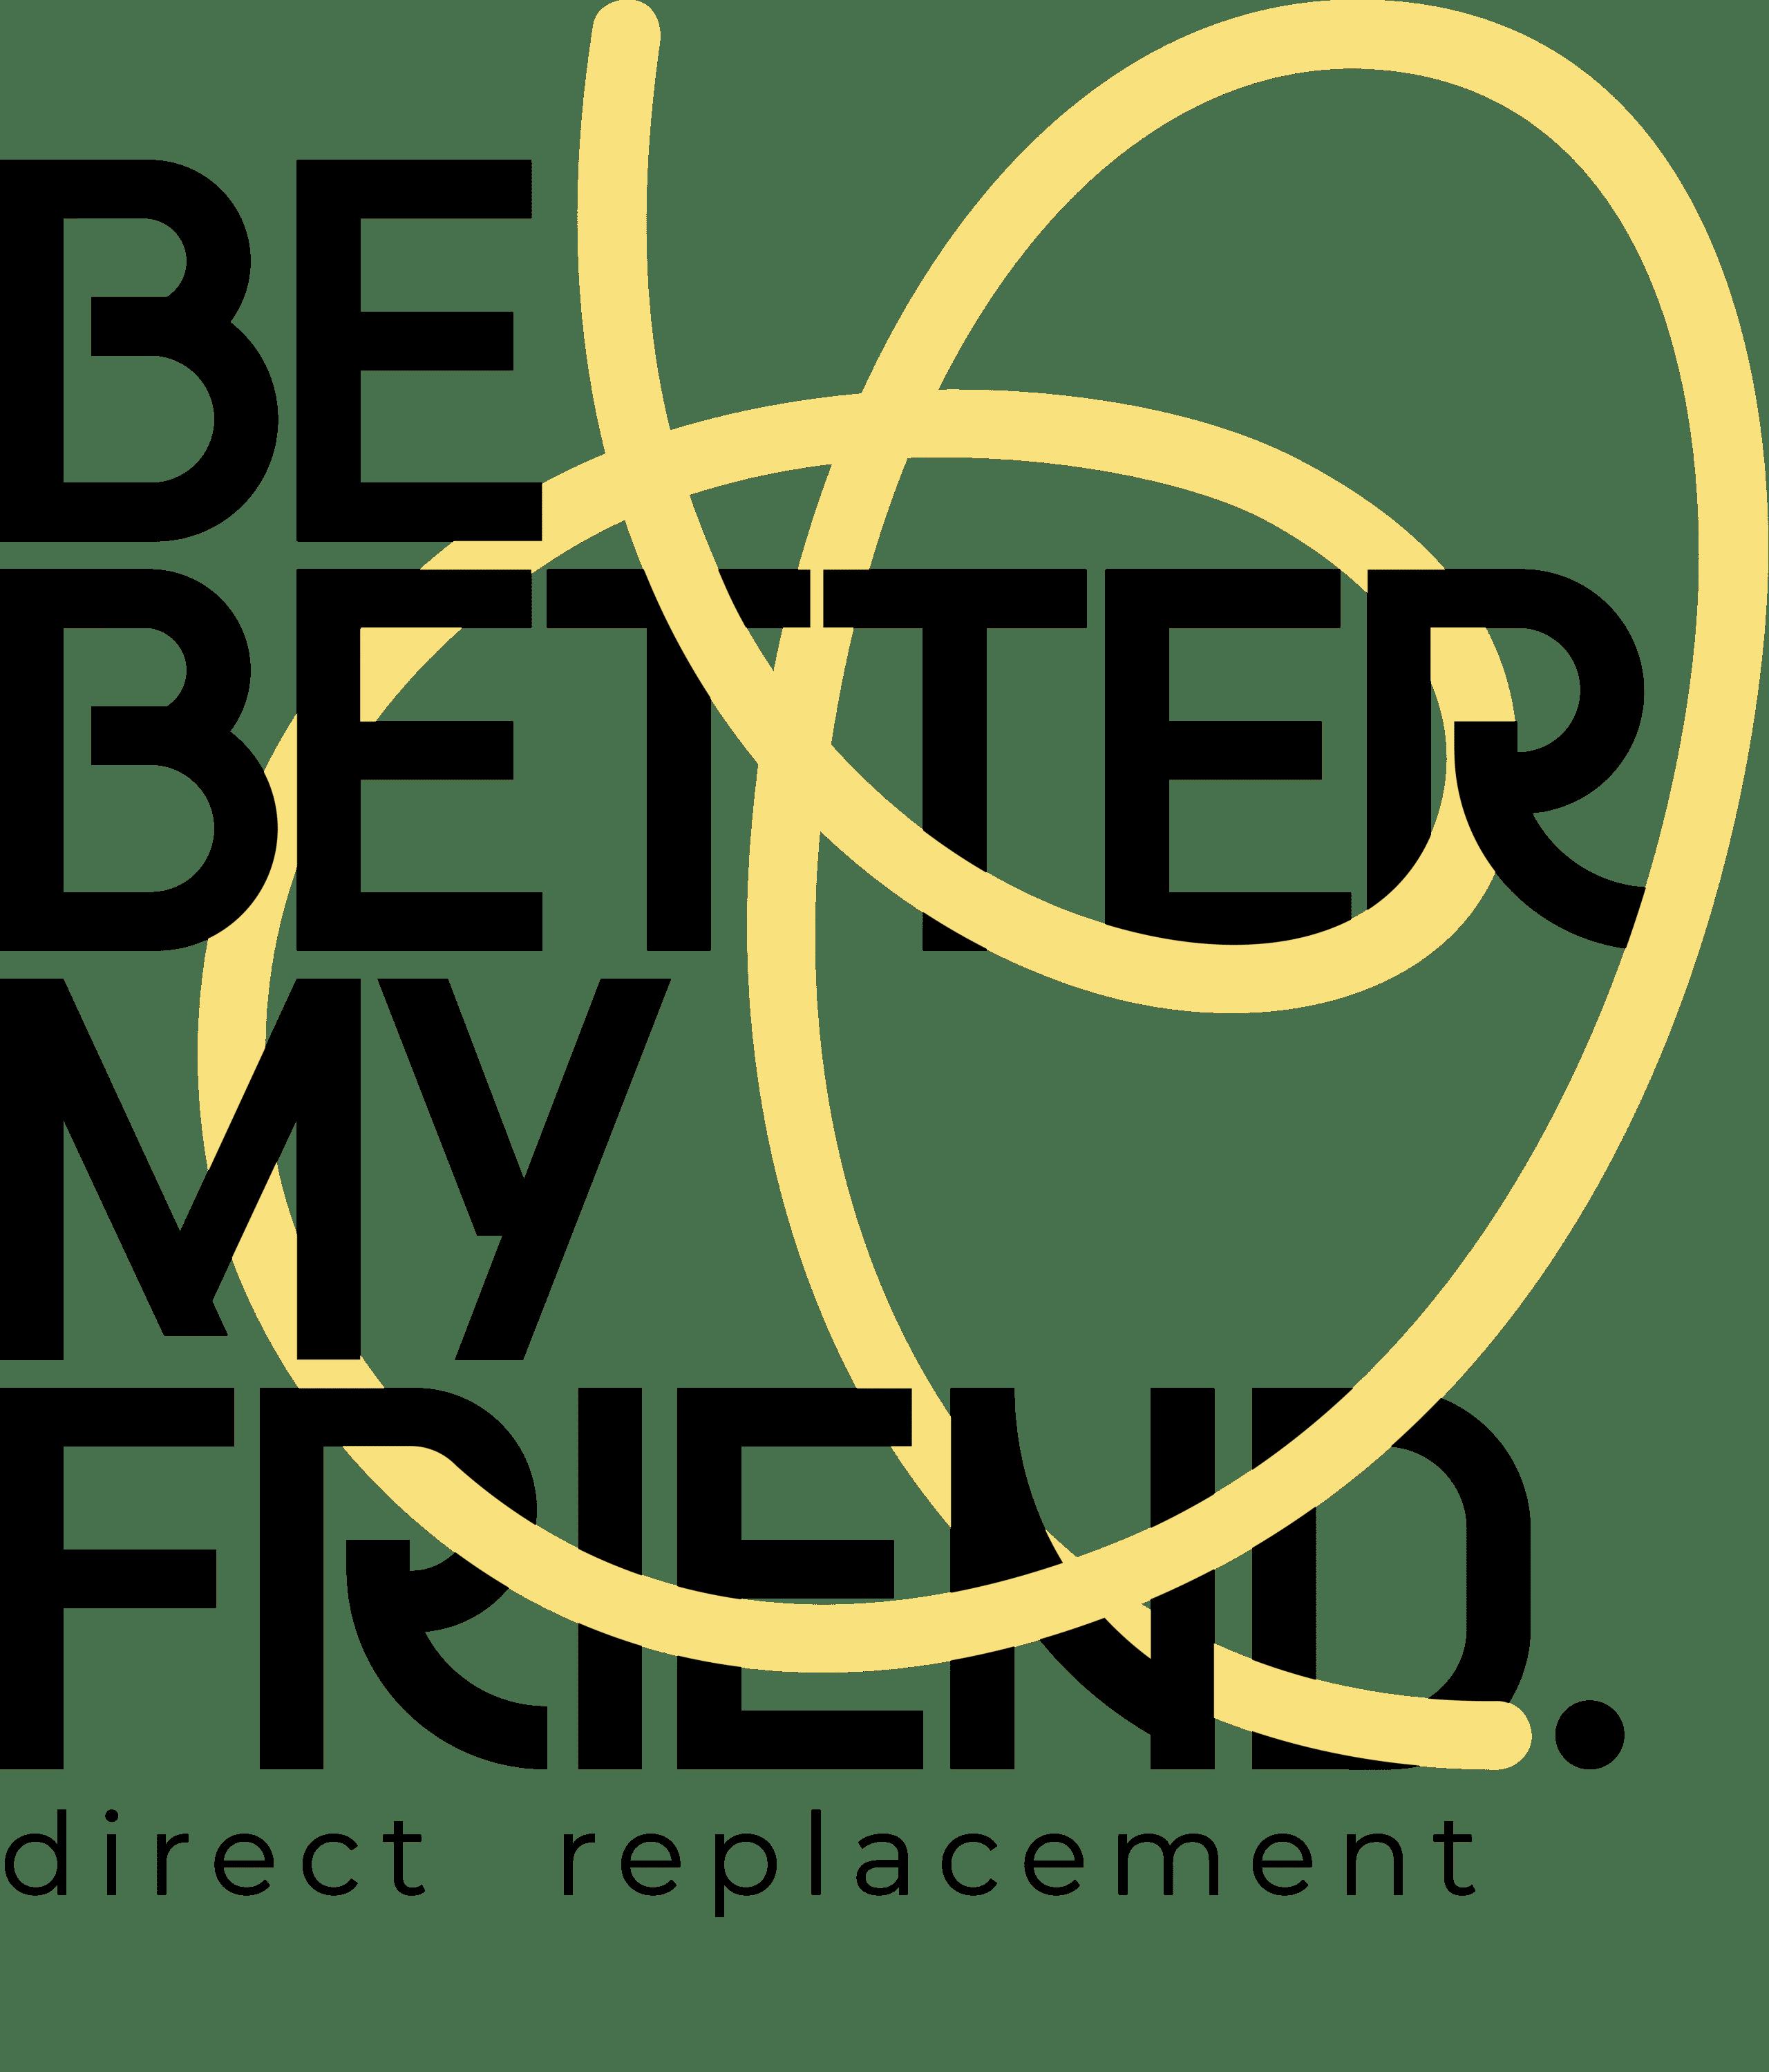 Be Better My Friend